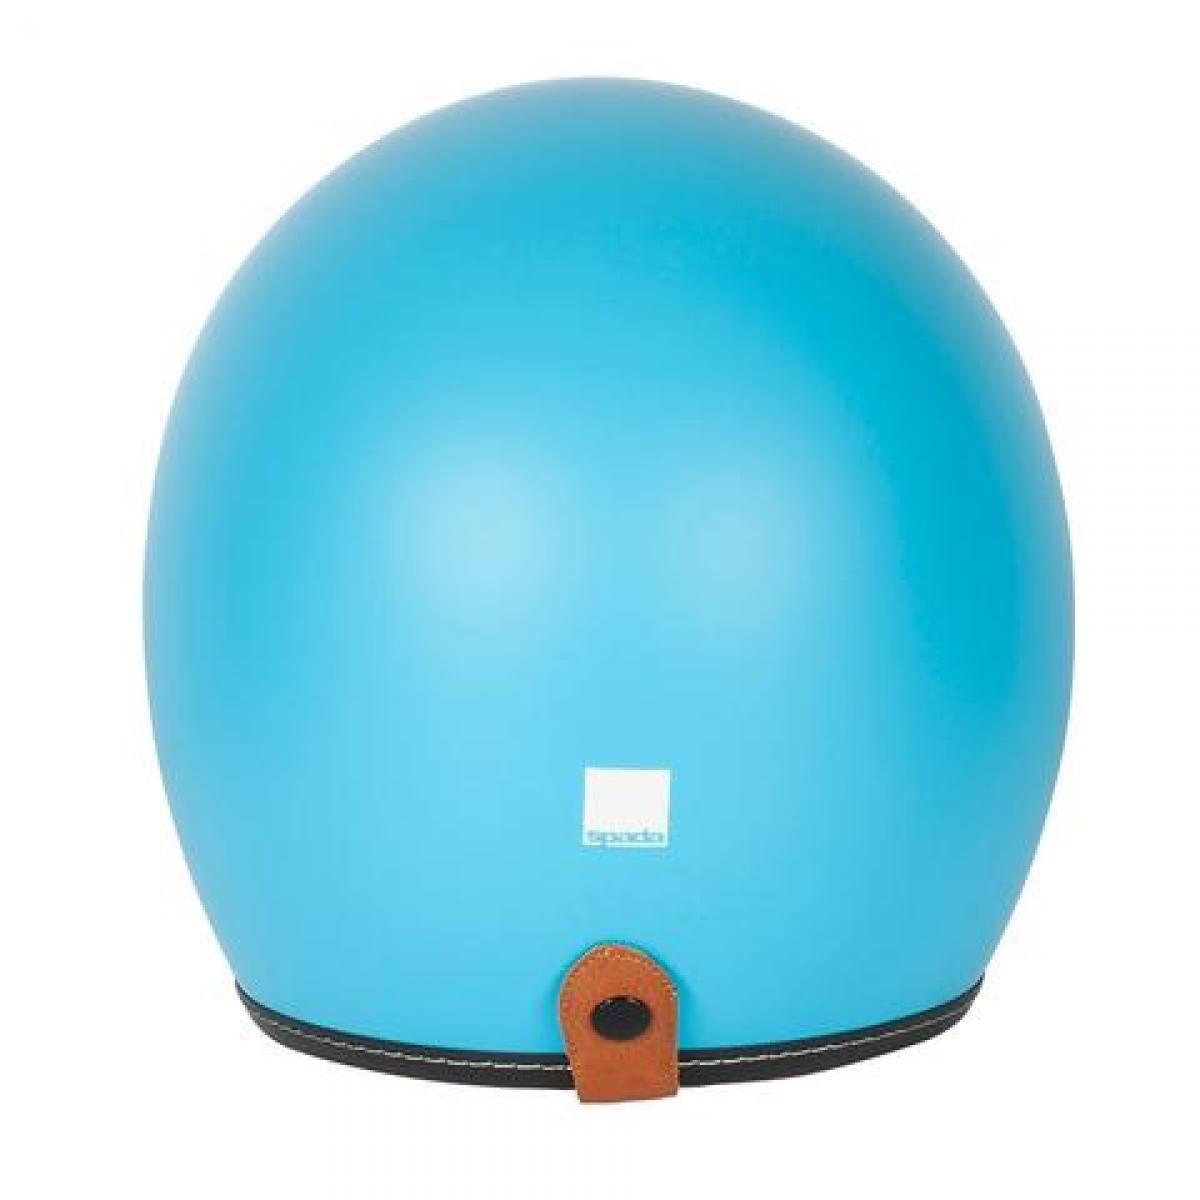 Spada-Raze-Ouvert-Casque-Bleu-Integre-Visiere miniature 6